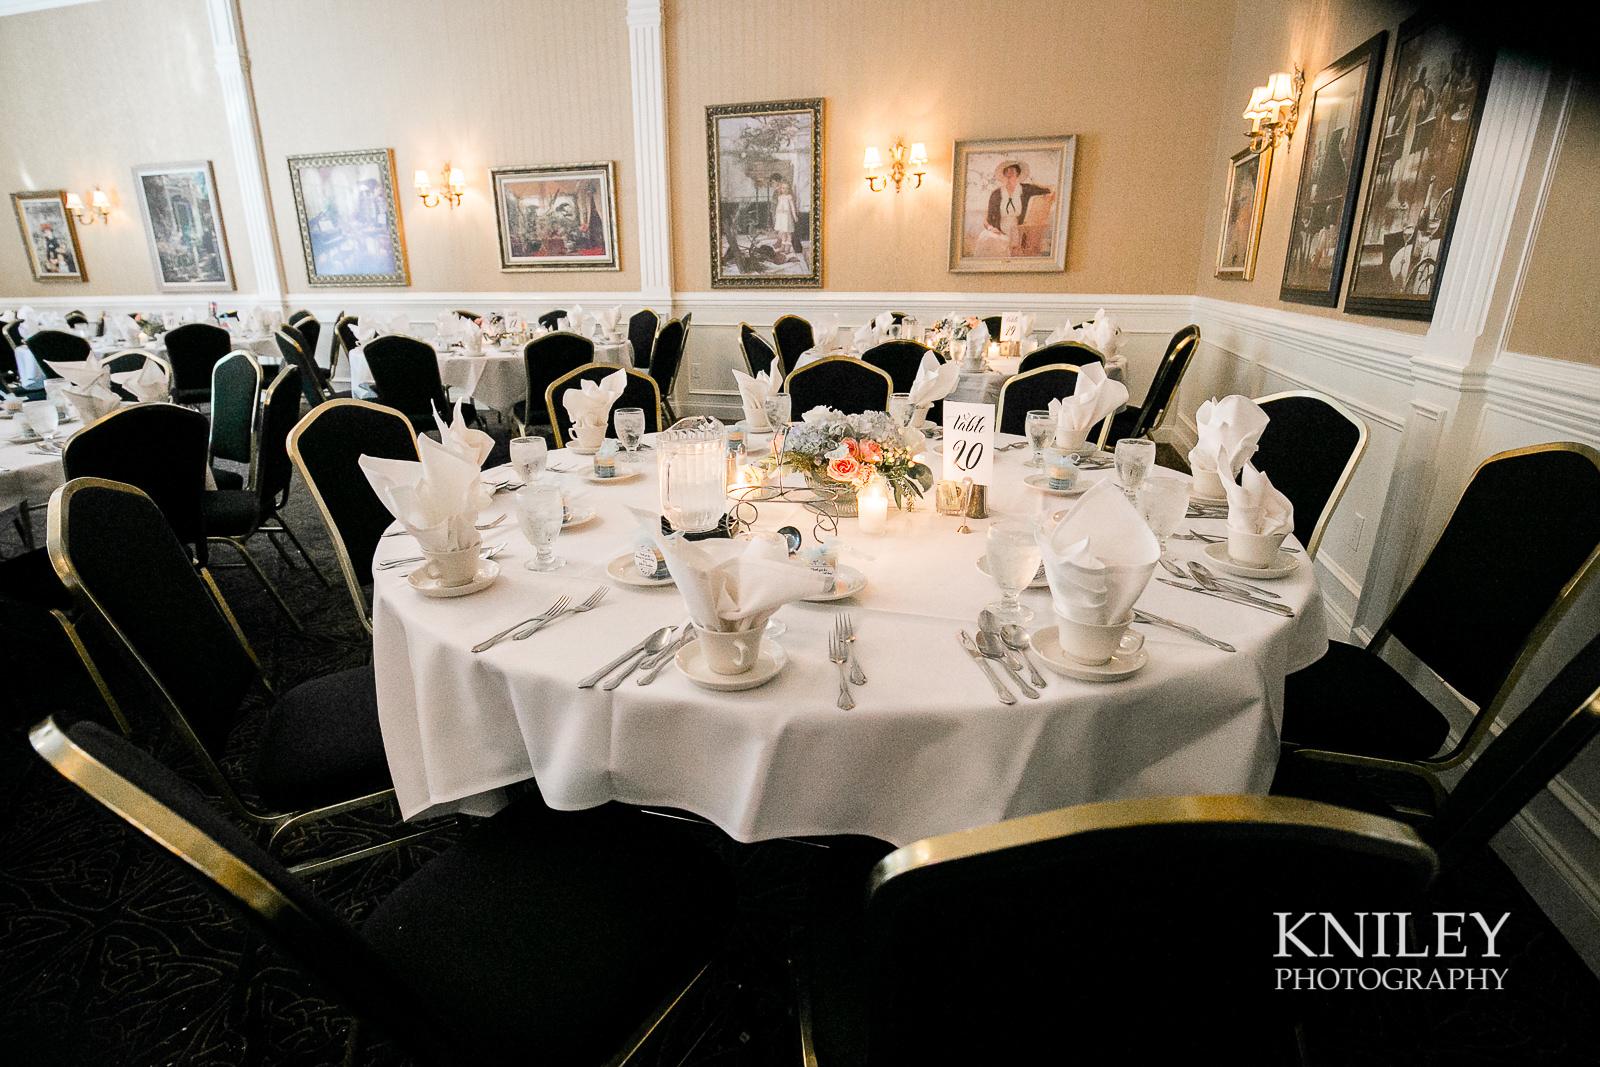 079 - Buffalo NY wedding pictures - Sean Patrick Restaurant Wedding Reception - Getzville - IMG_8298.jpg